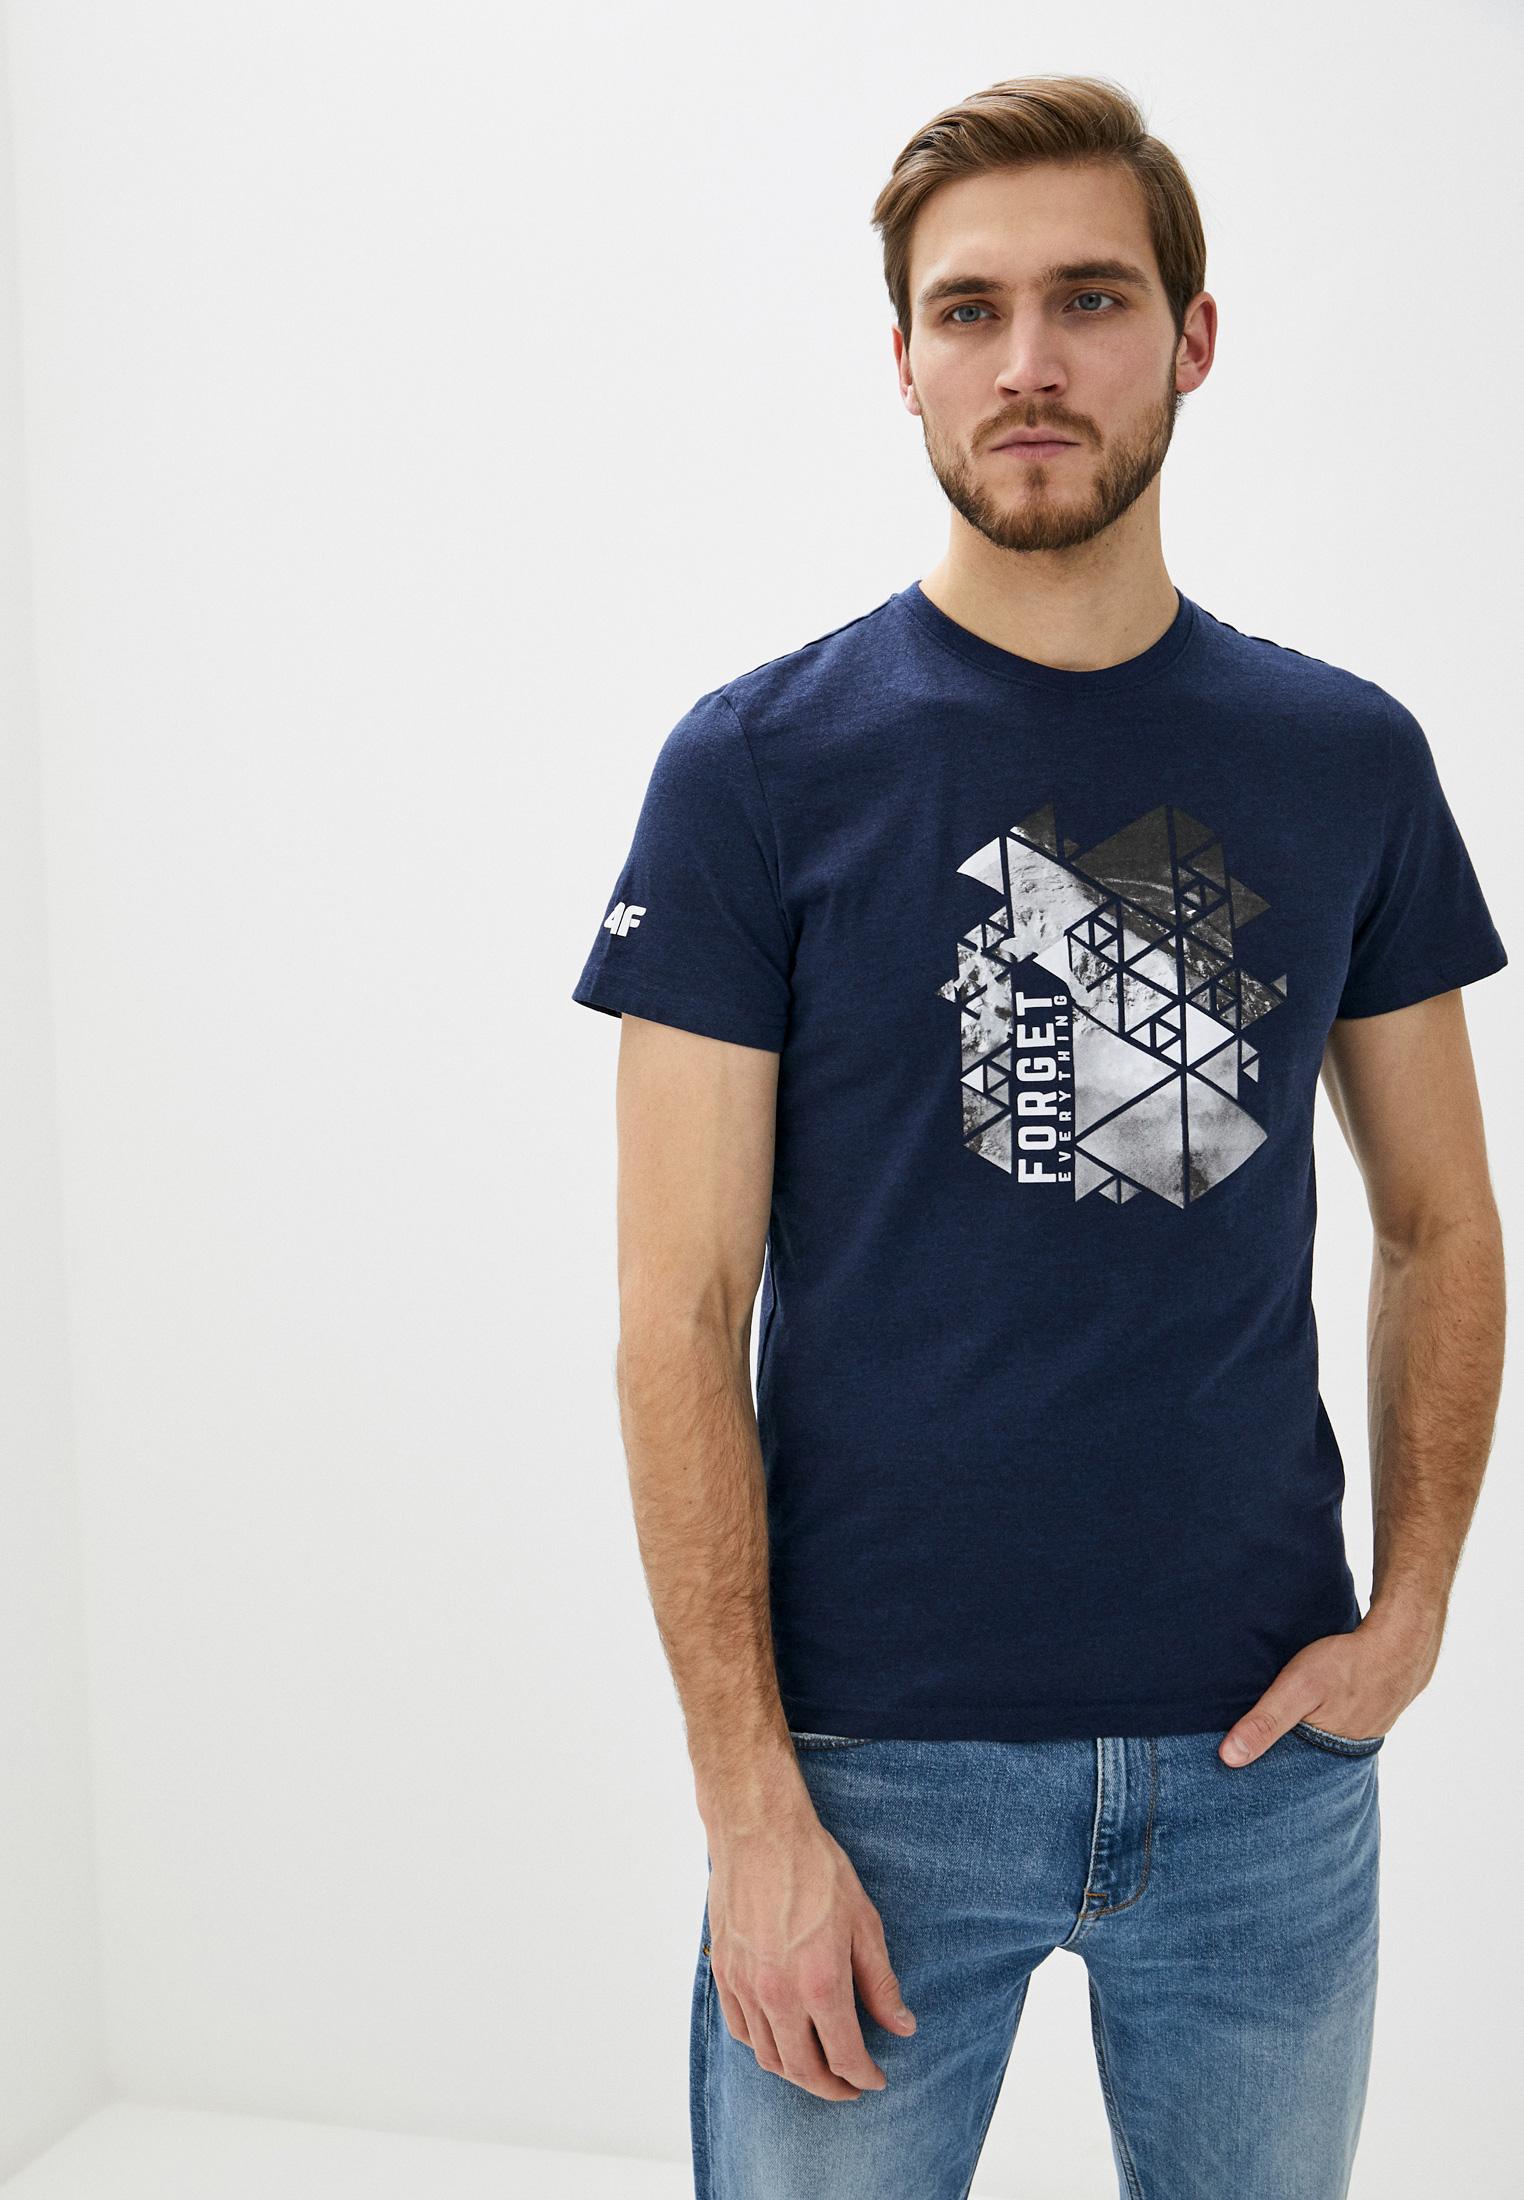 футболка с фото волгоград средневекового